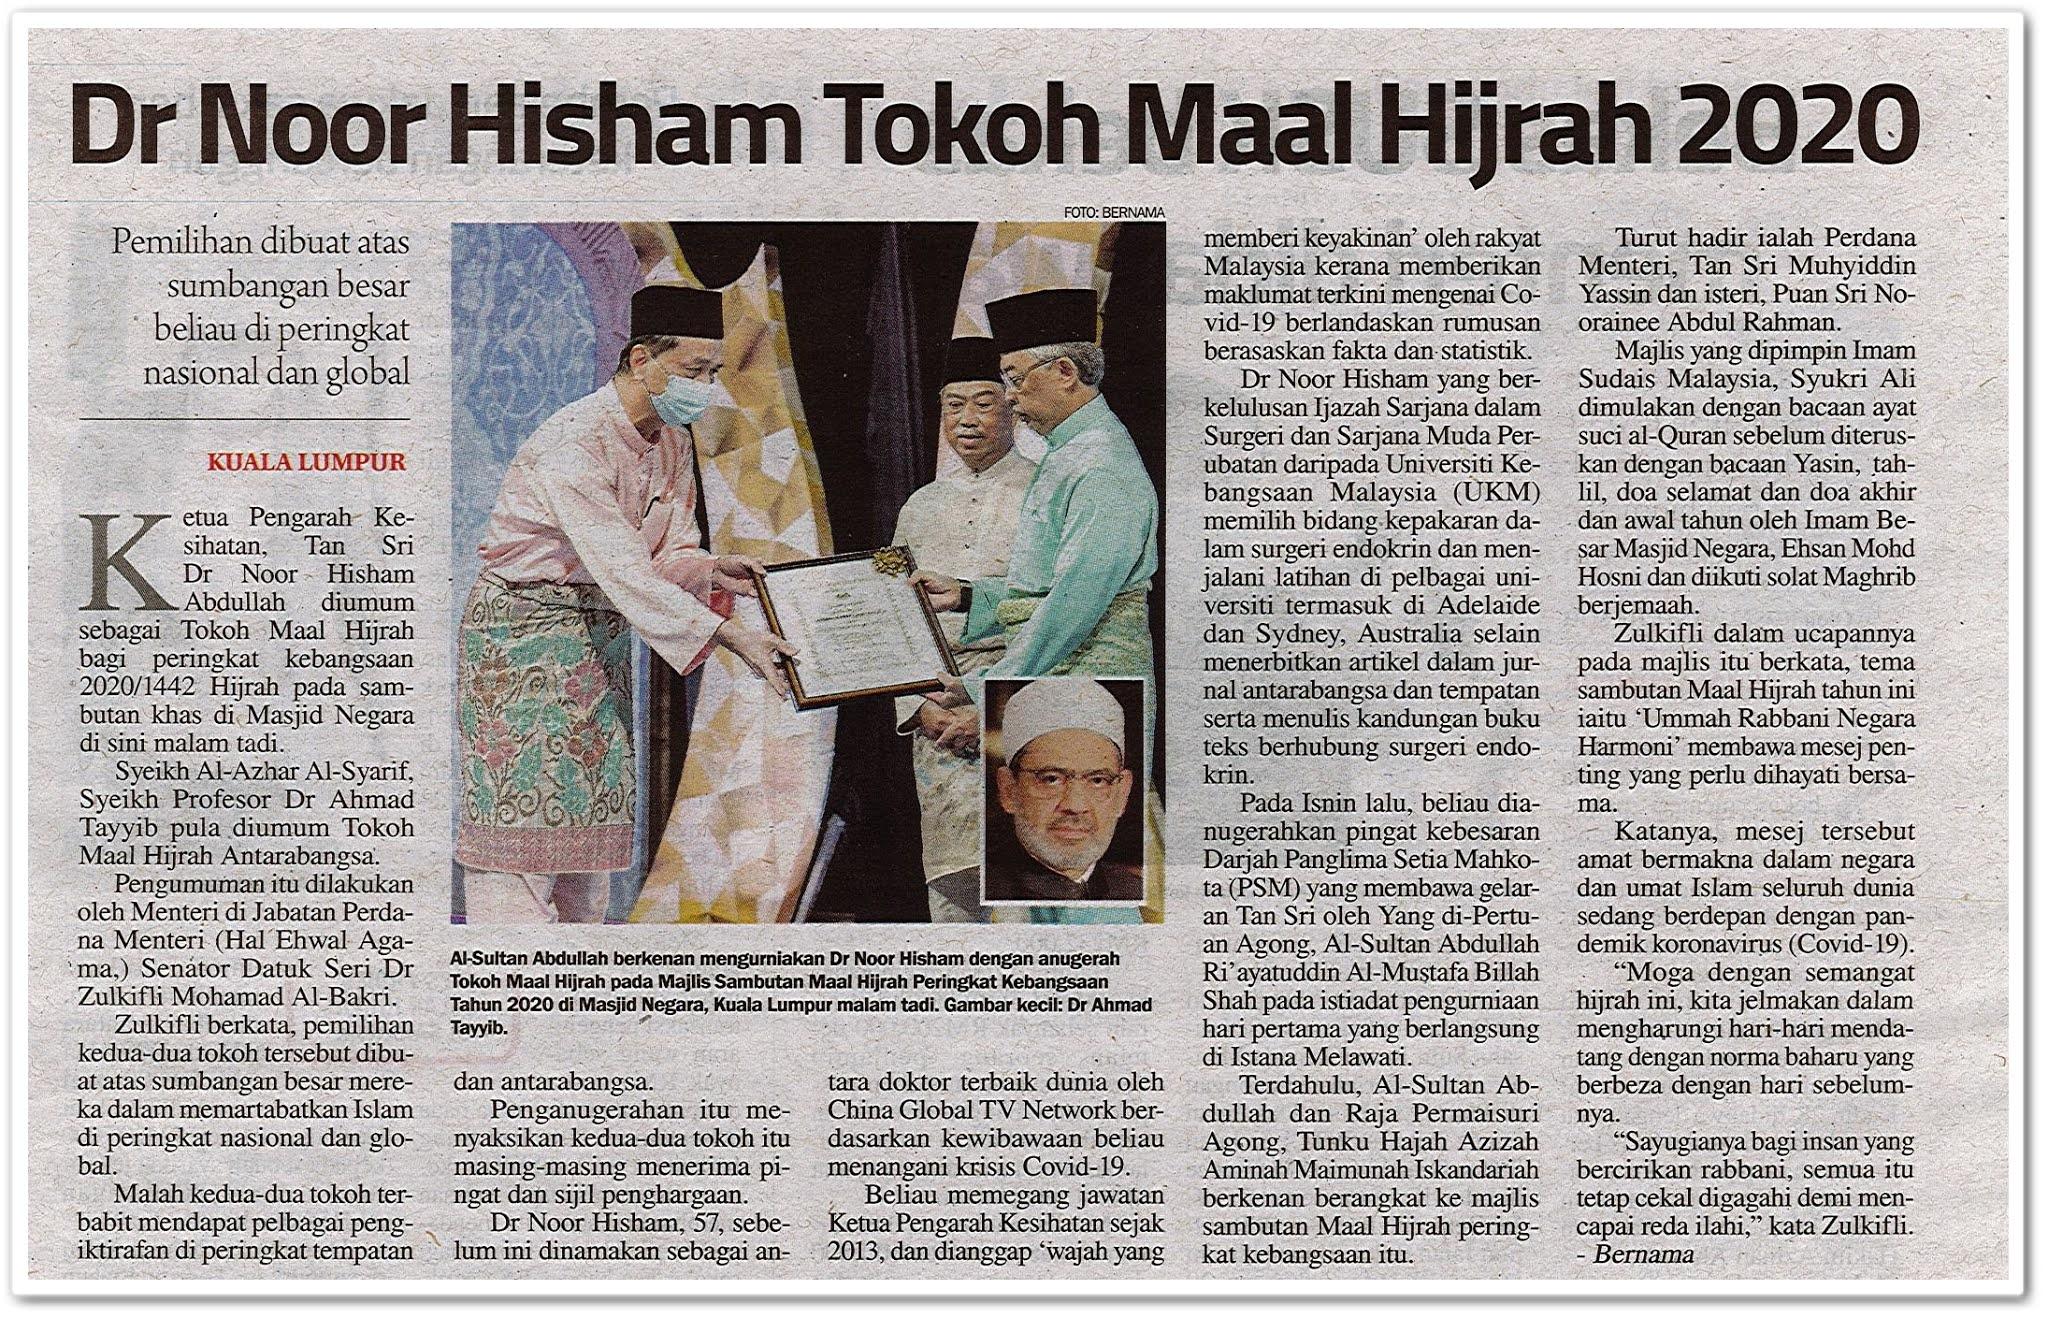 Dr. Noor Hisham Tokol Maal Hijrah 2020 - Keratan akhbar Sinar Harian 20 Ogos 2020